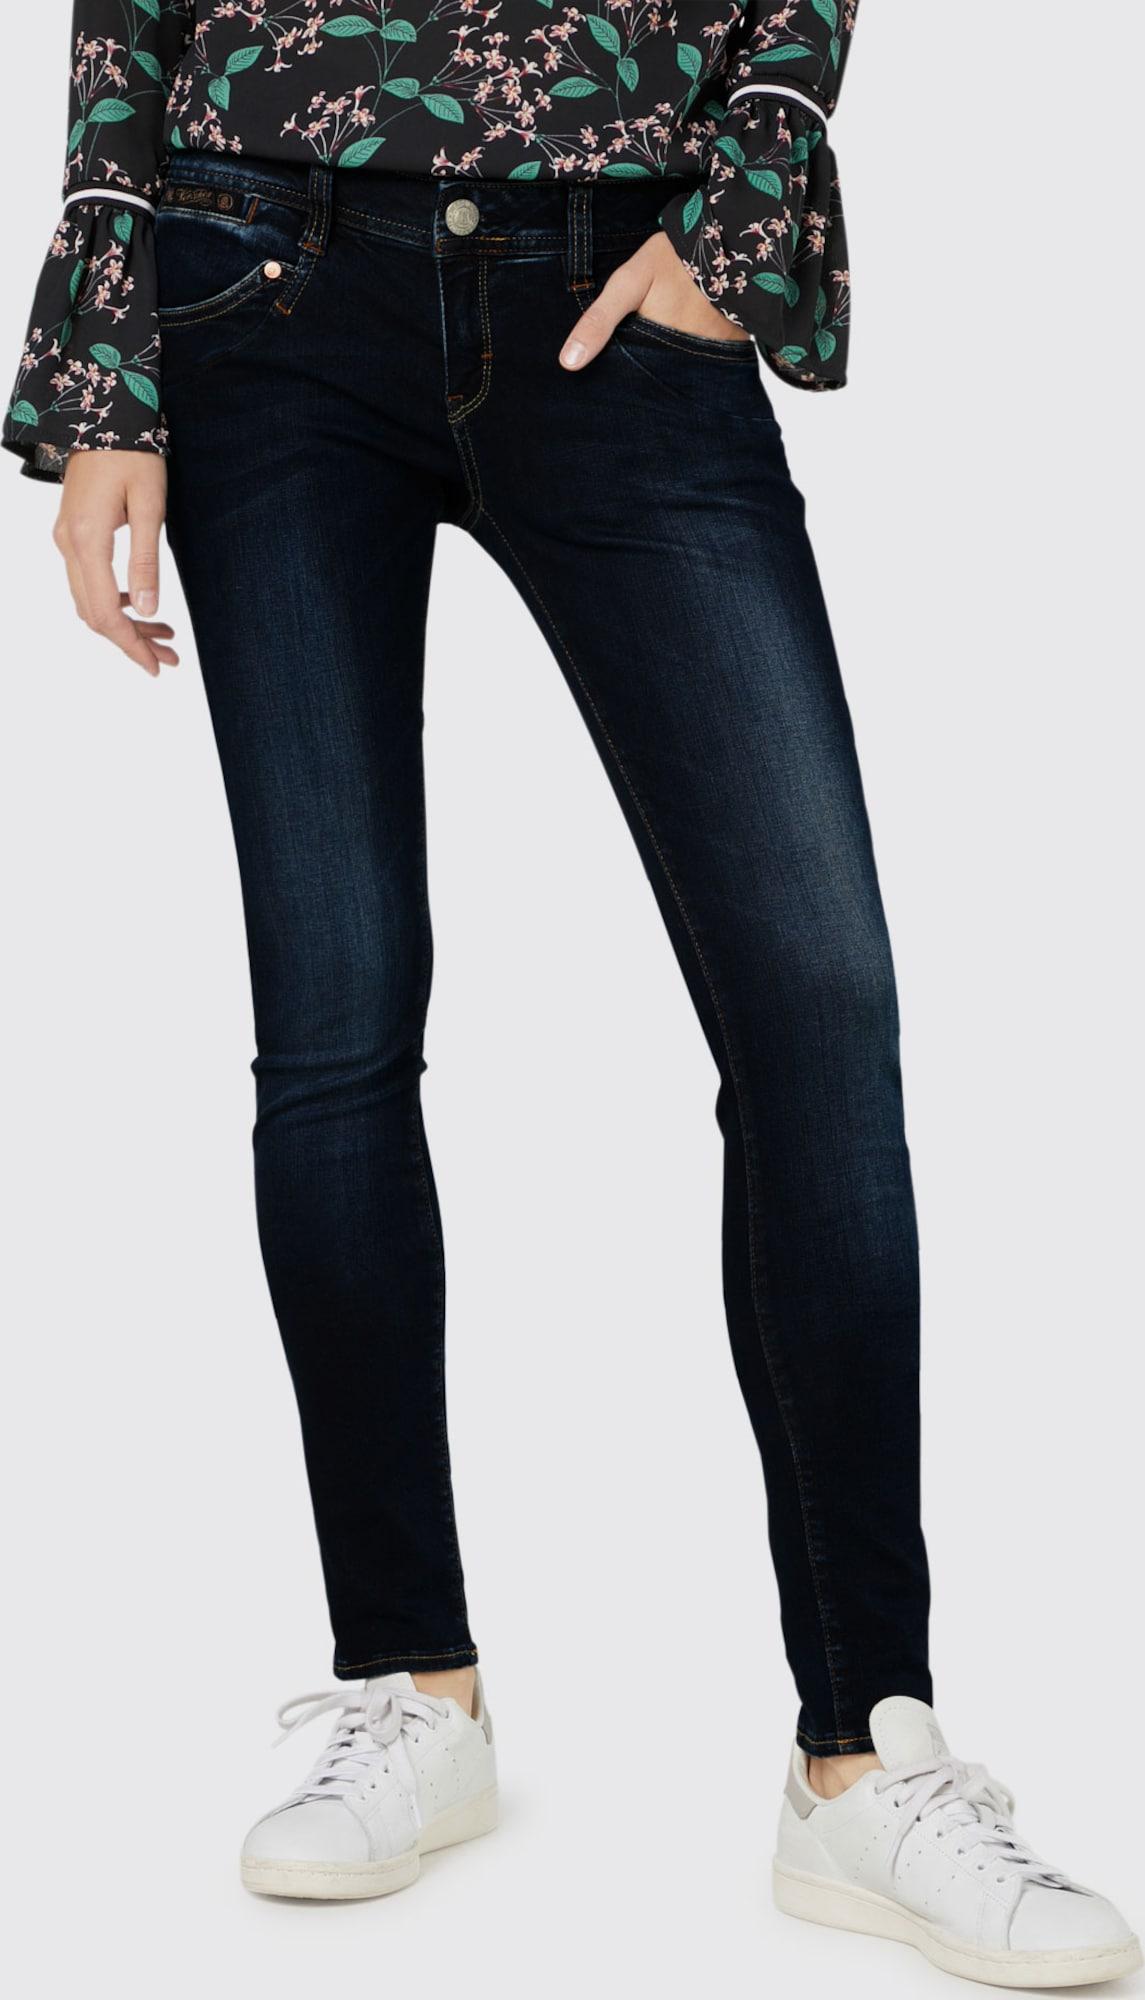 herrlicher 39 piper 39 slim fit jeans in blau about you. Black Bedroom Furniture Sets. Home Design Ideas